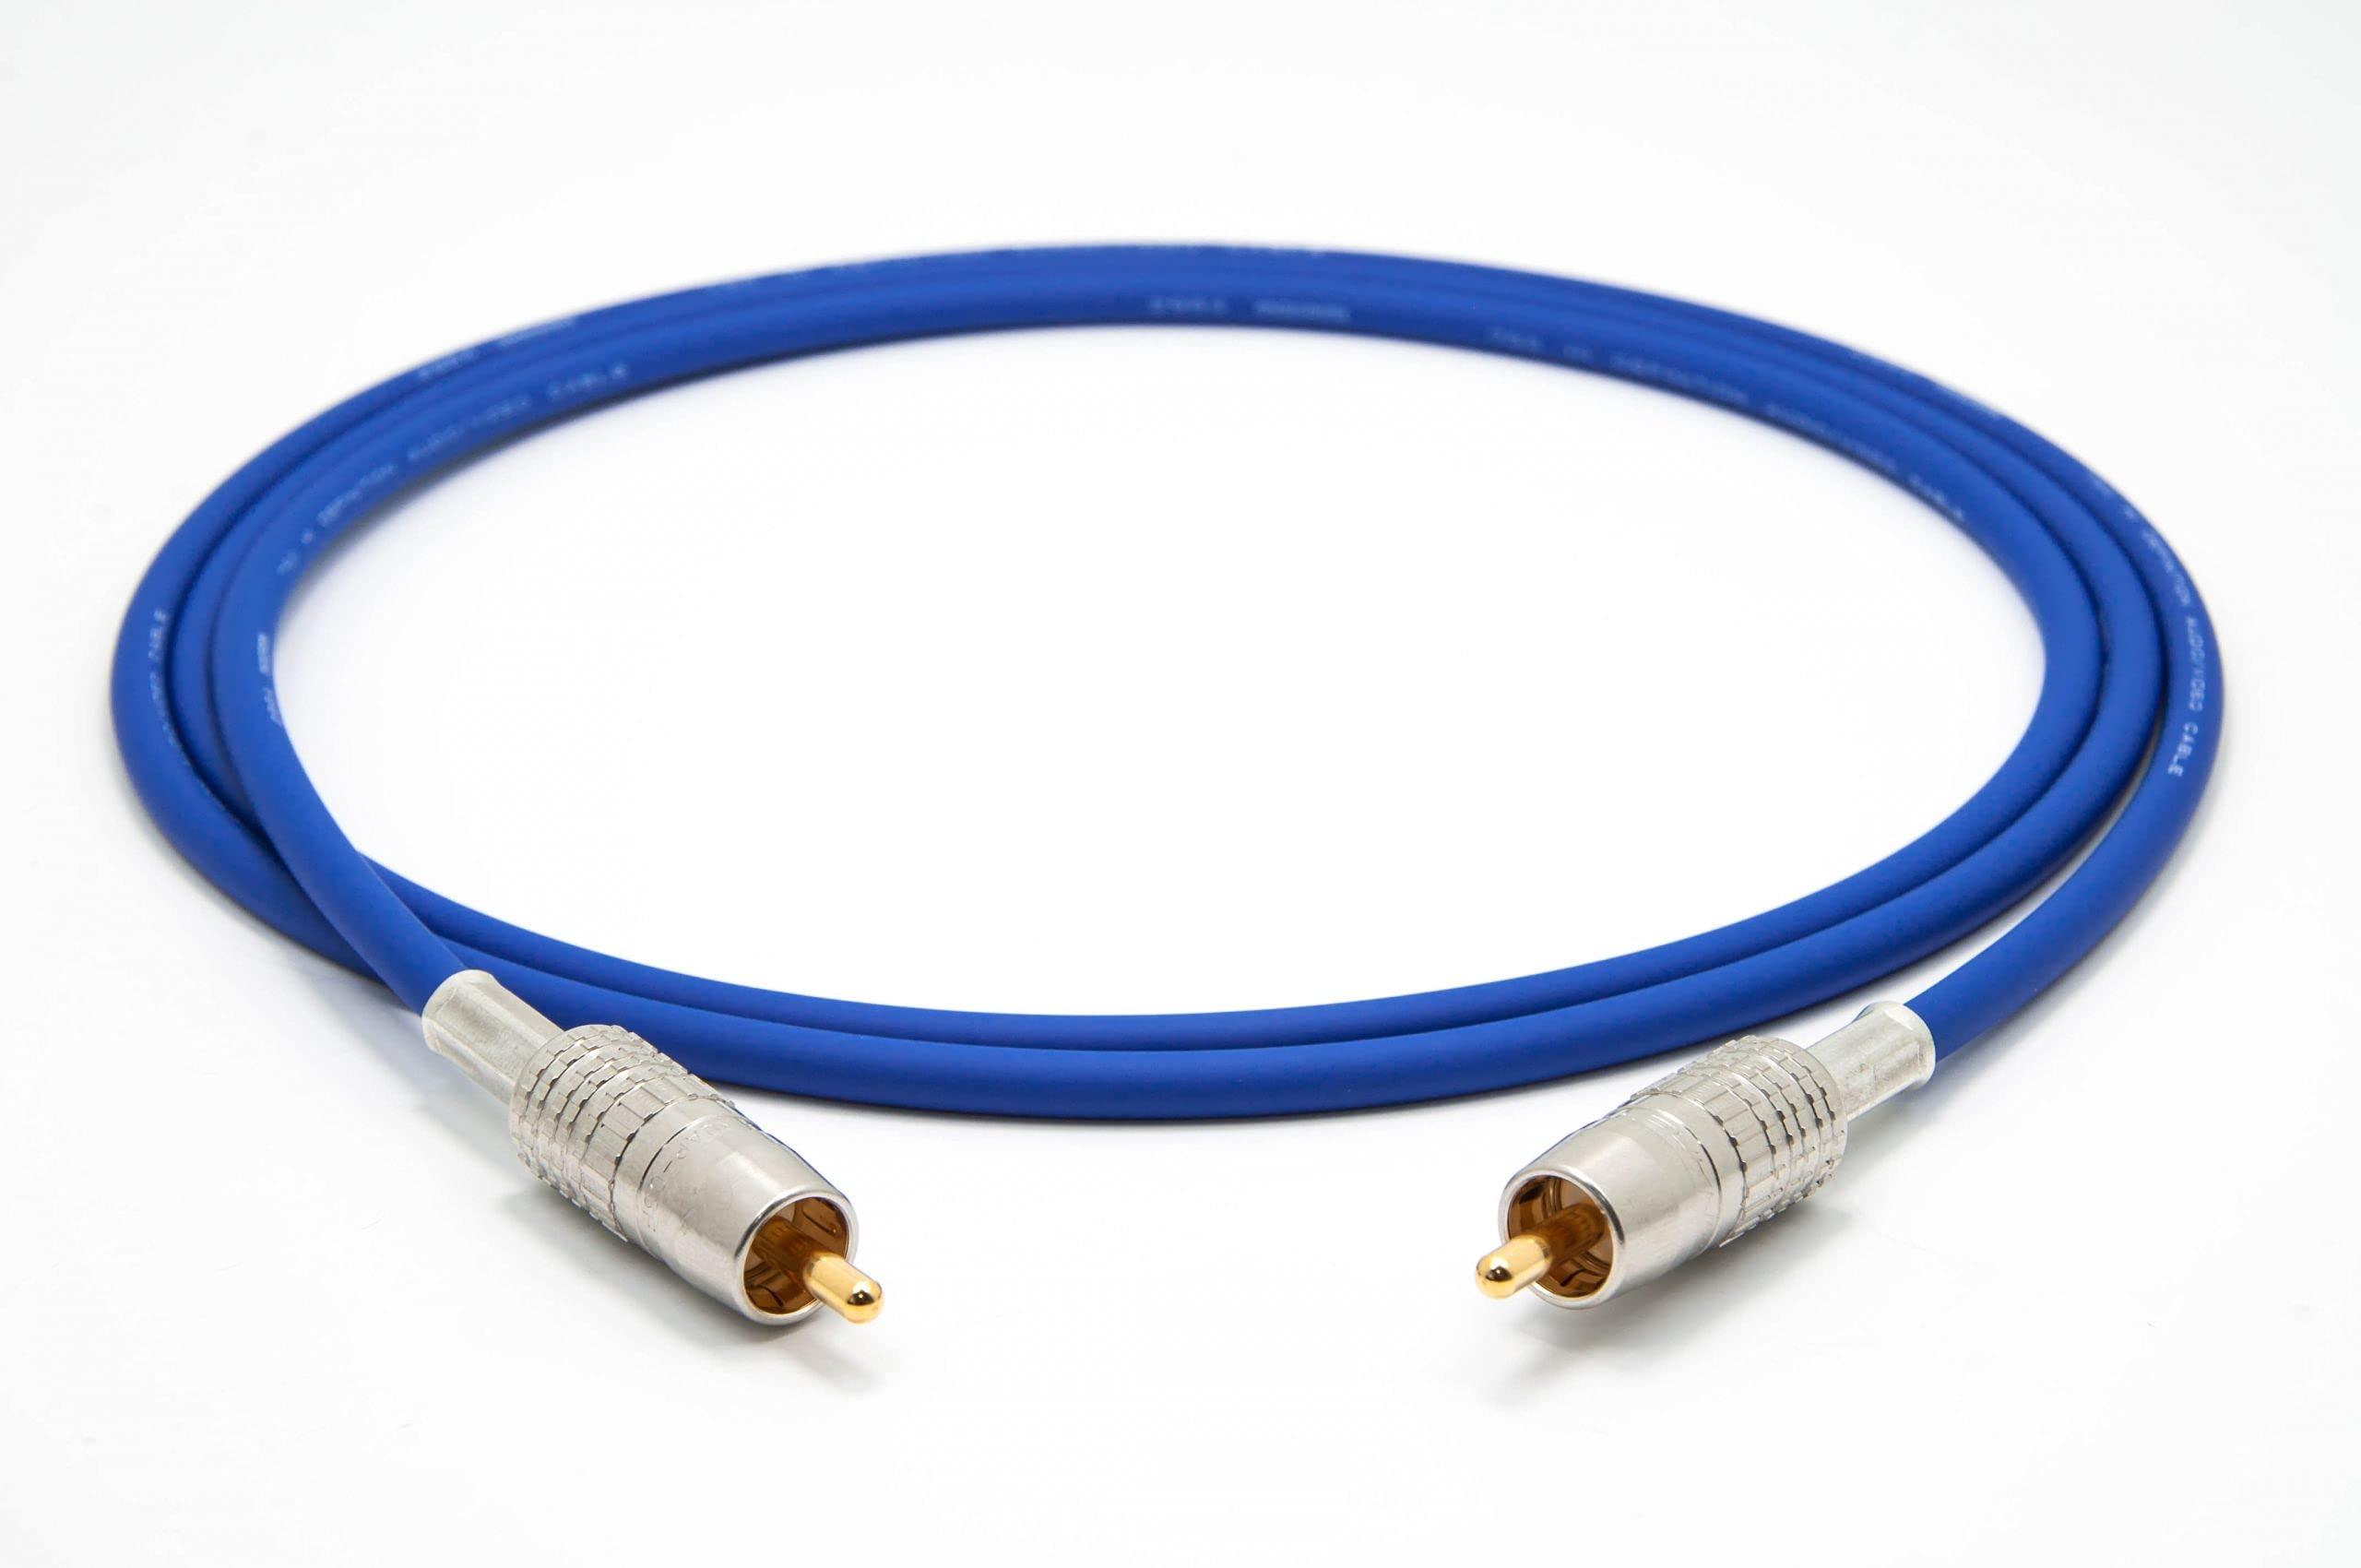 Mogami 2964 Digital Coaxial Cable 75 Ohm S/PDIF | Canare Gold RCA | HiFi - 3.0 m